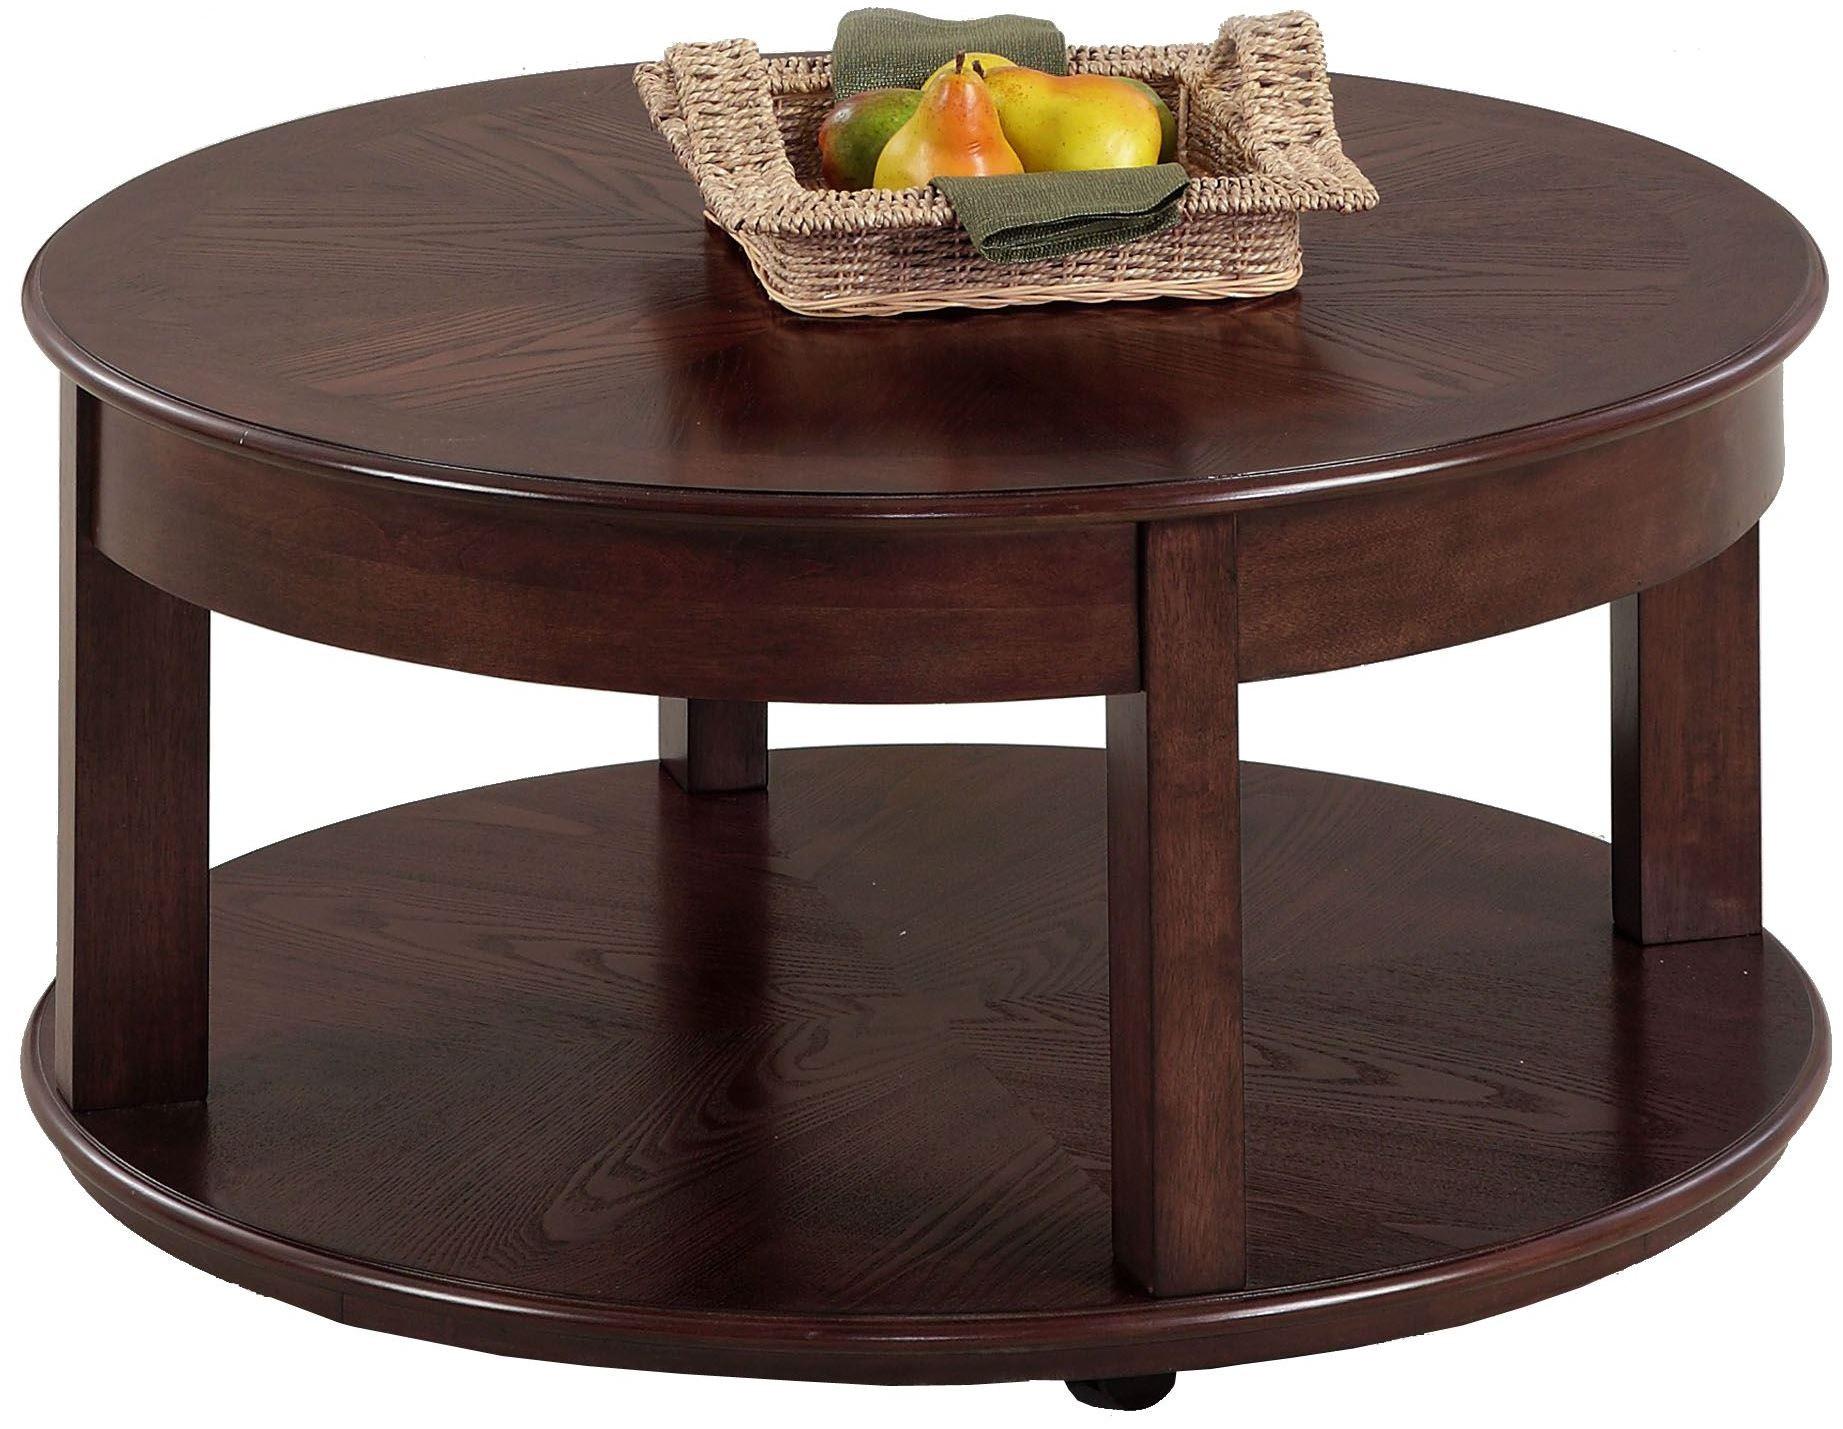 Sebring Medium Ash Round Cocktail Table From Progressive